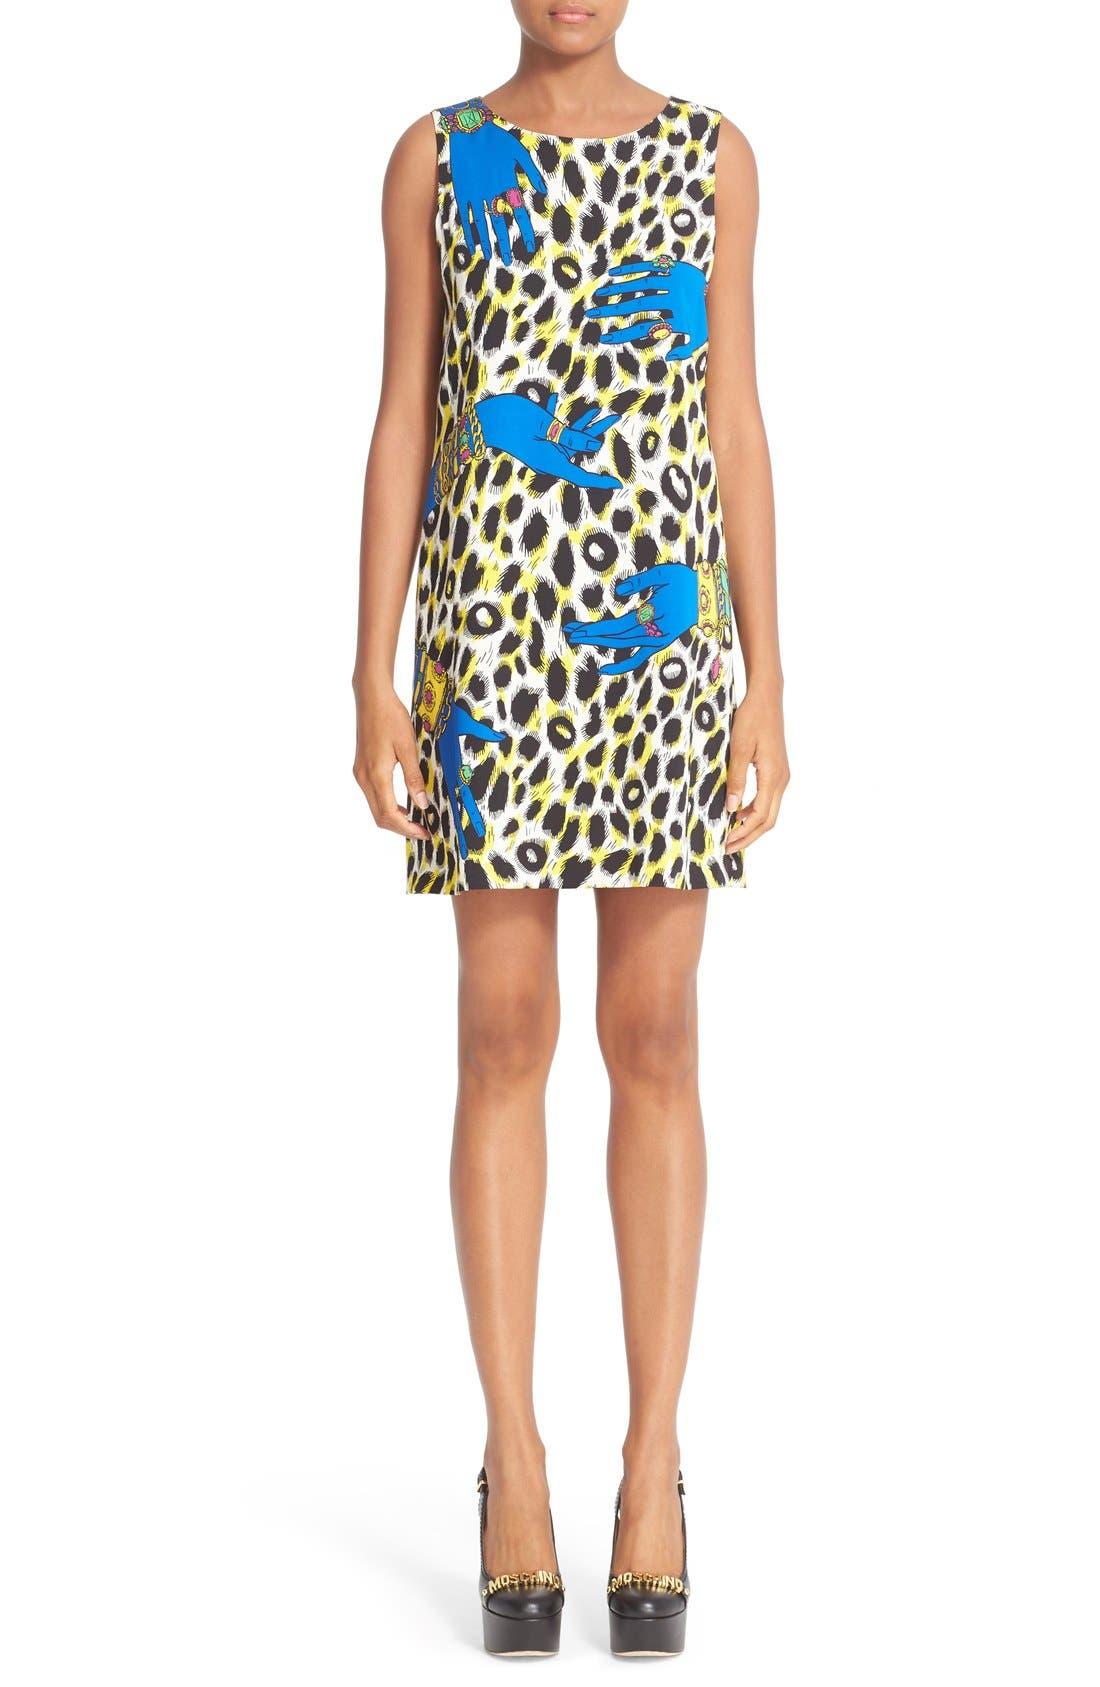 MOSCHINO Leopard Print Satin Shift Dress